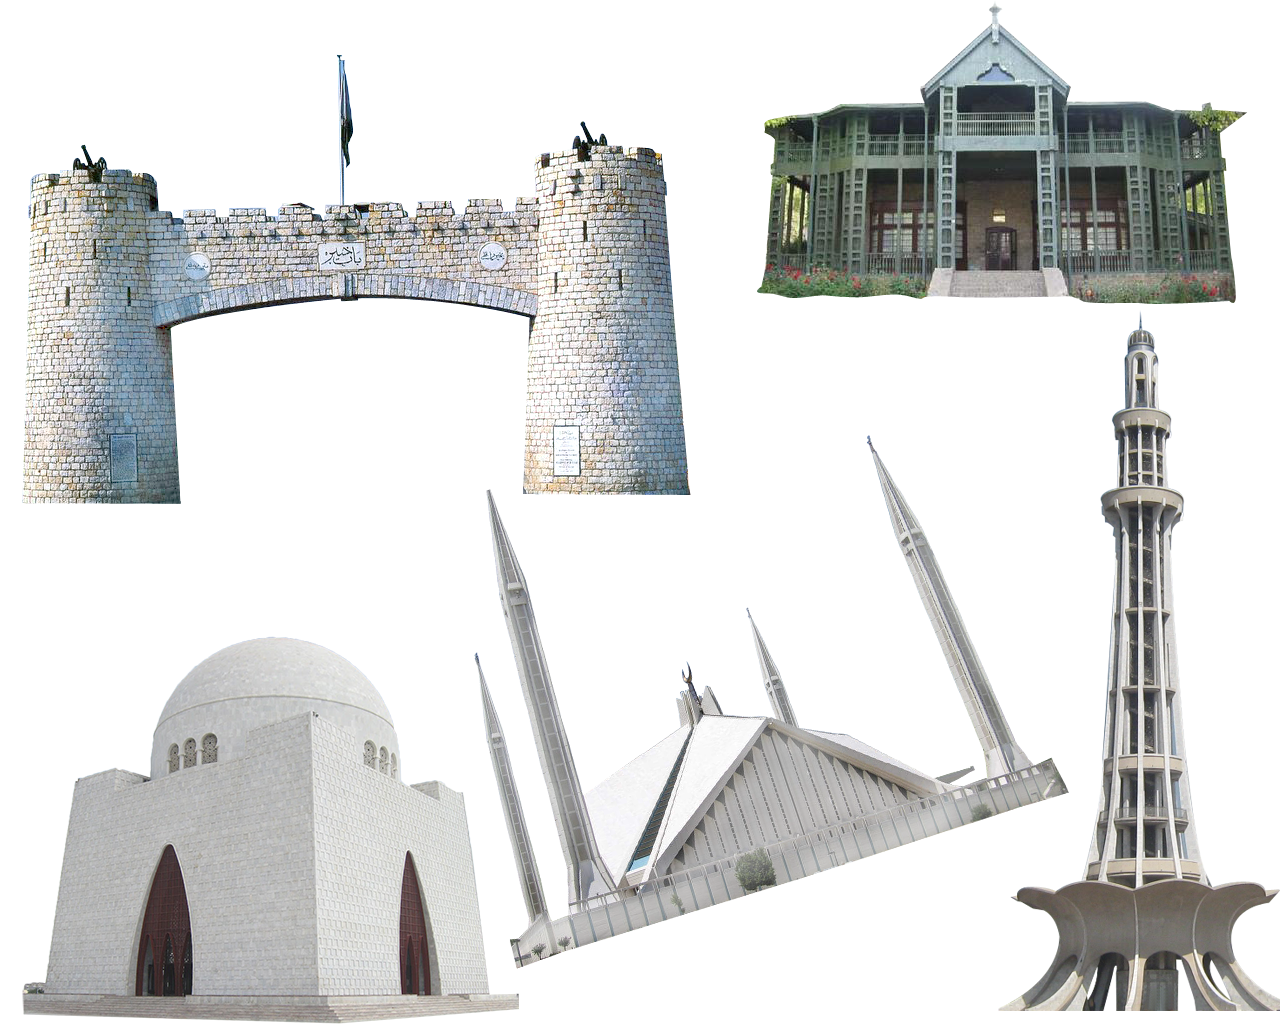 Pakistan monuments famous places png by KhaleeqXaman on